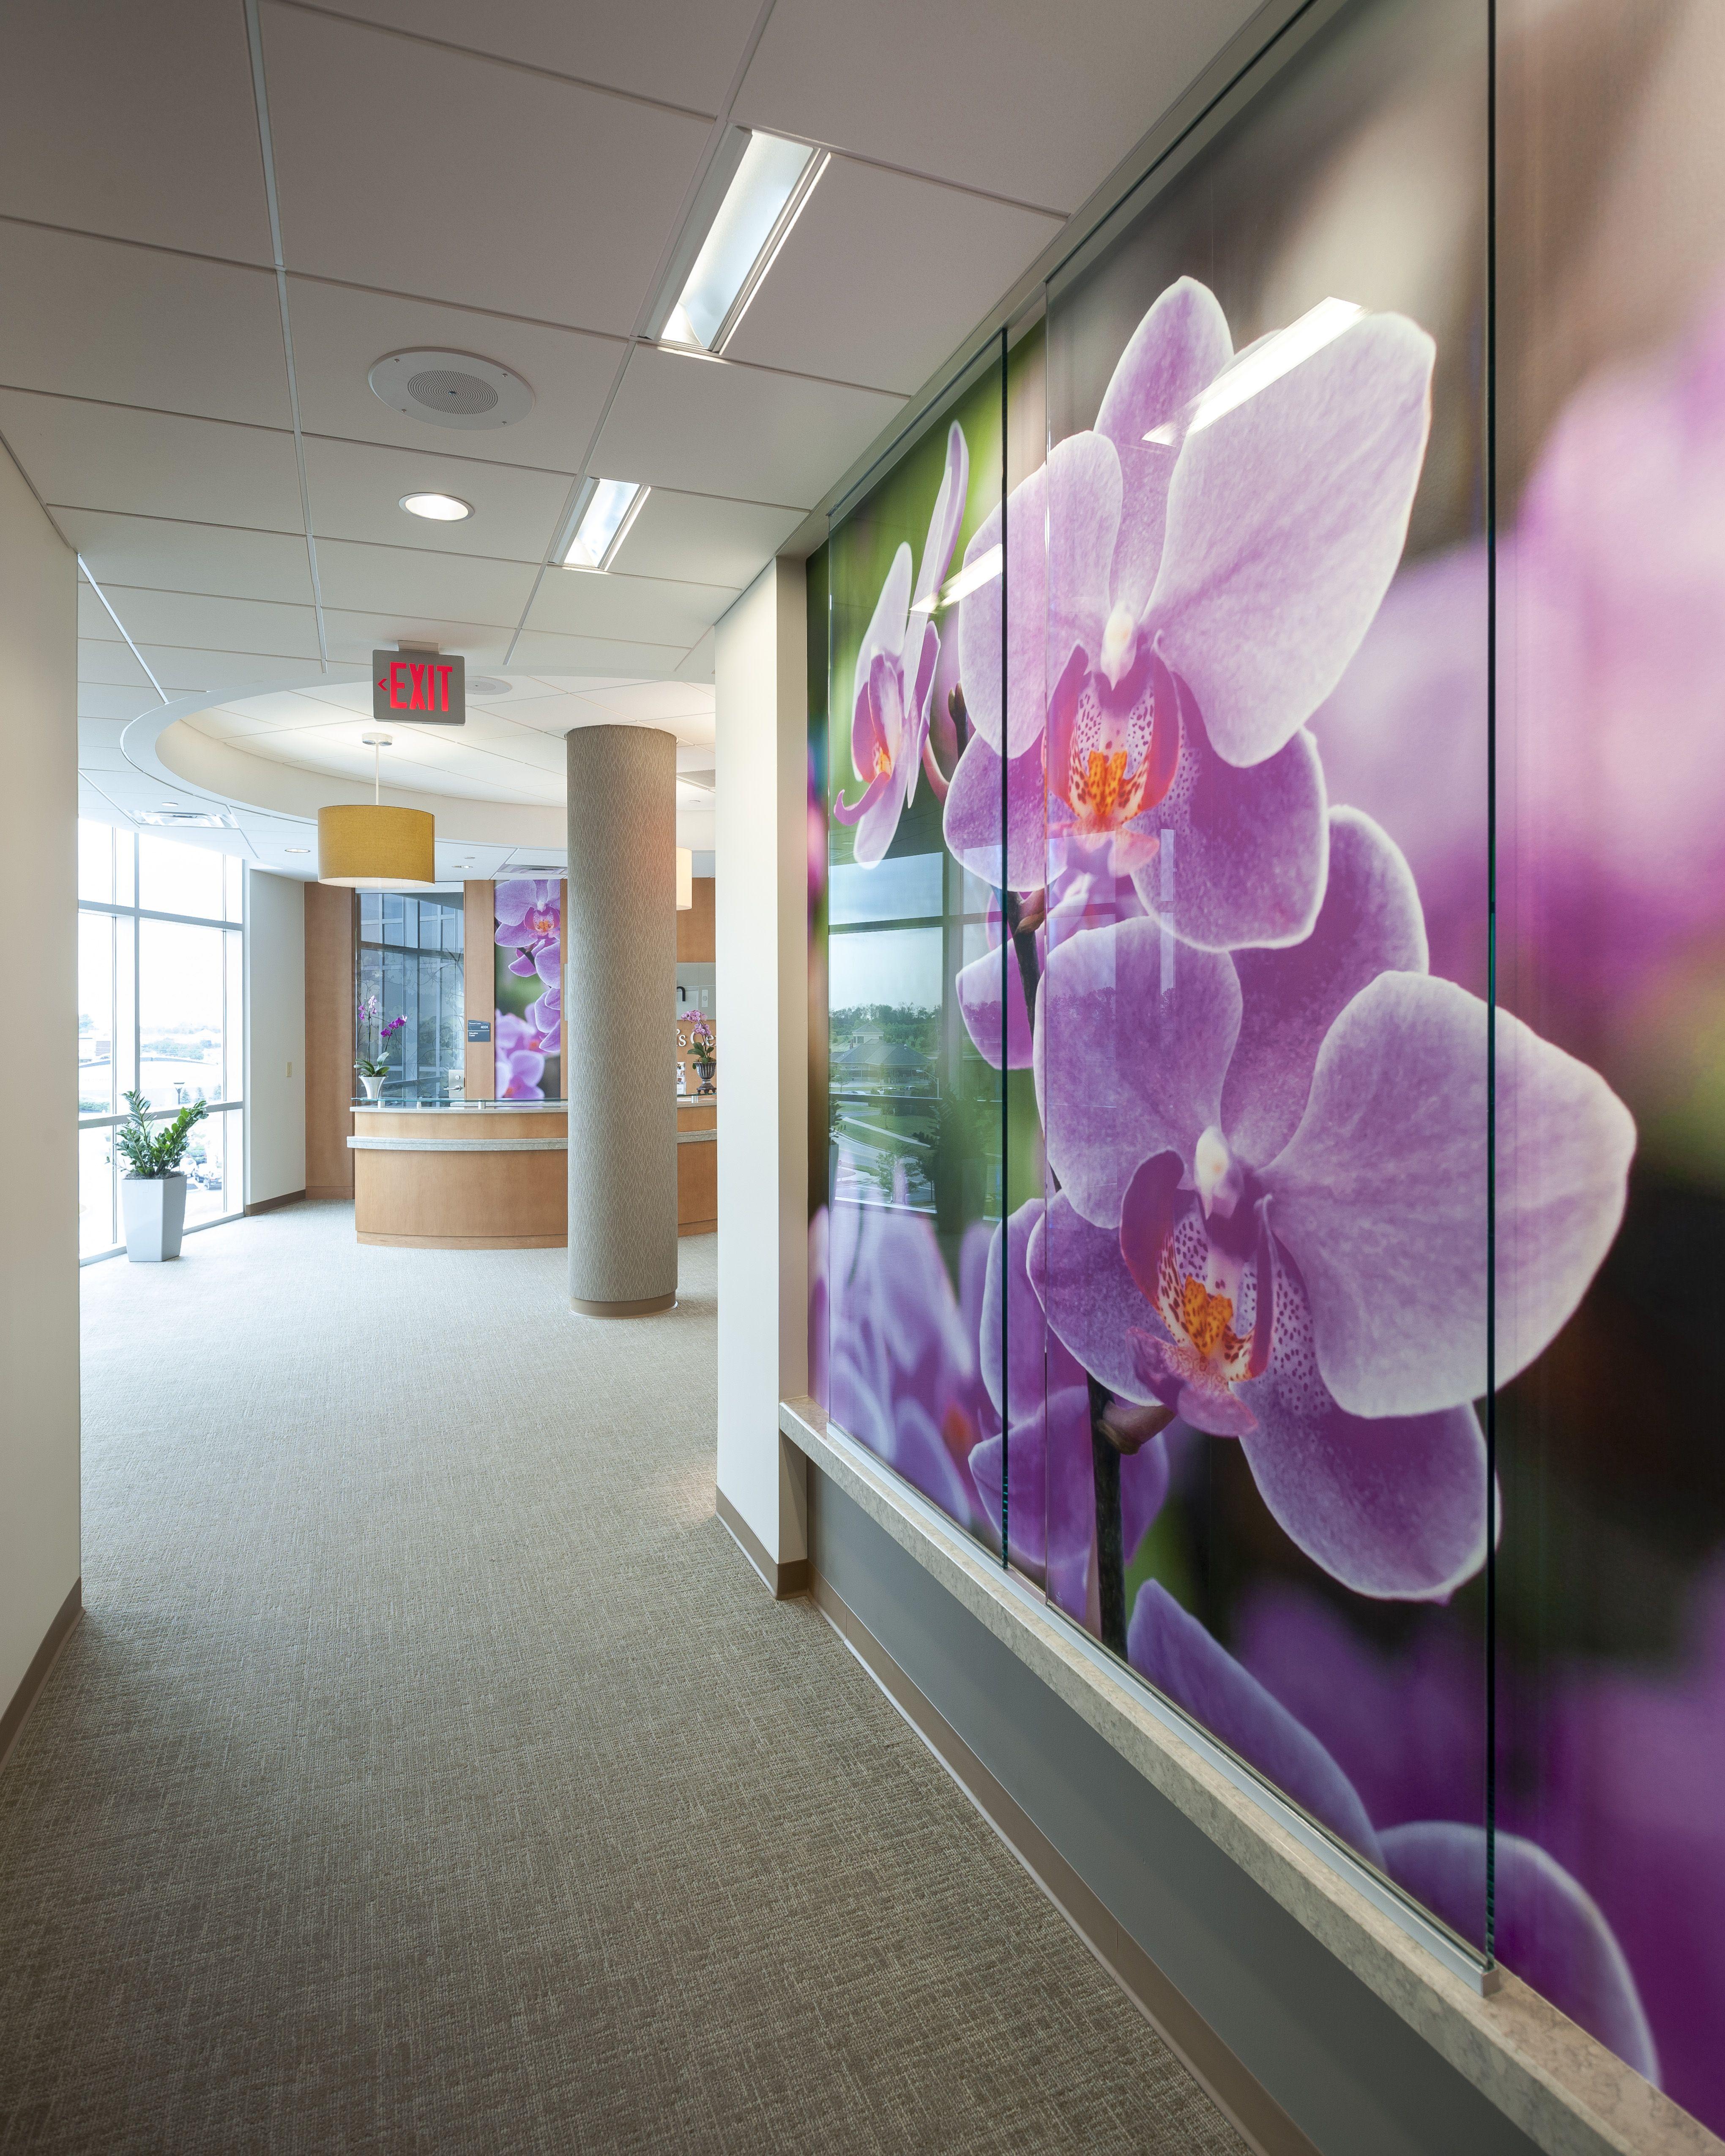 Hospital Room Interior Design: UC Health Women's Center - In Cincinnati, OH